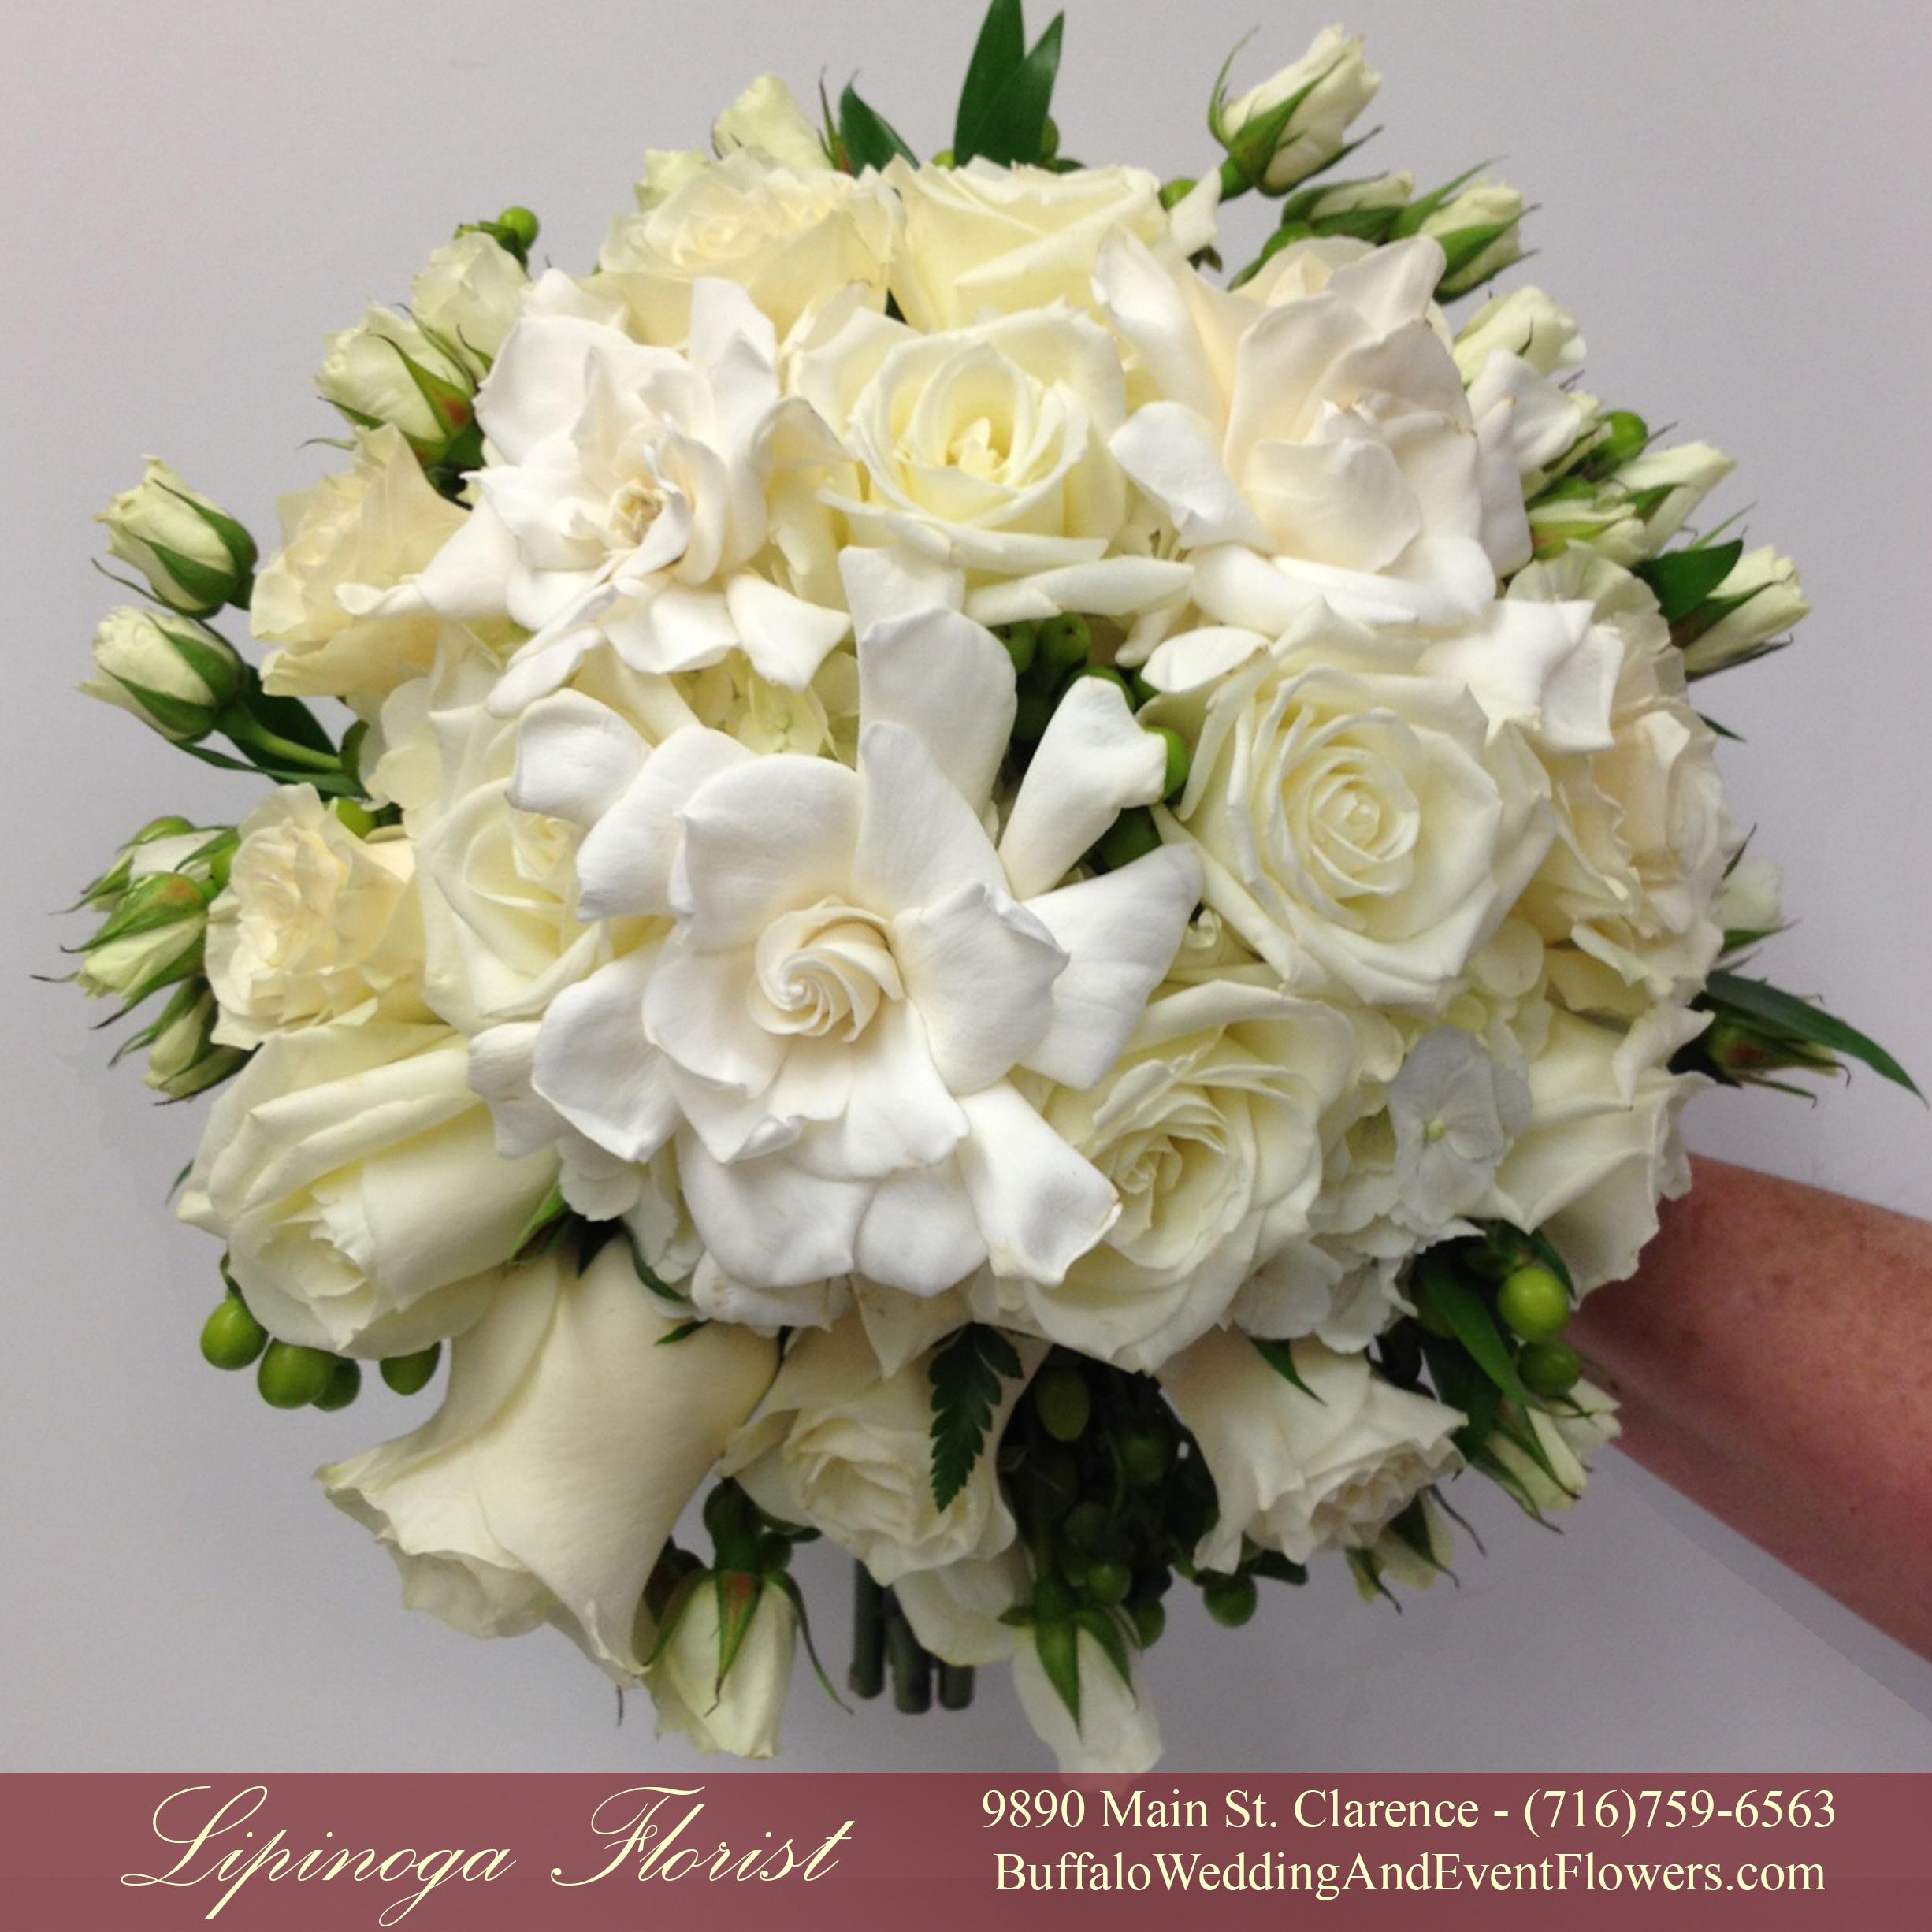 Cermony Flowers Buffalo Wedding Event Flowers By Lipinoga Florist